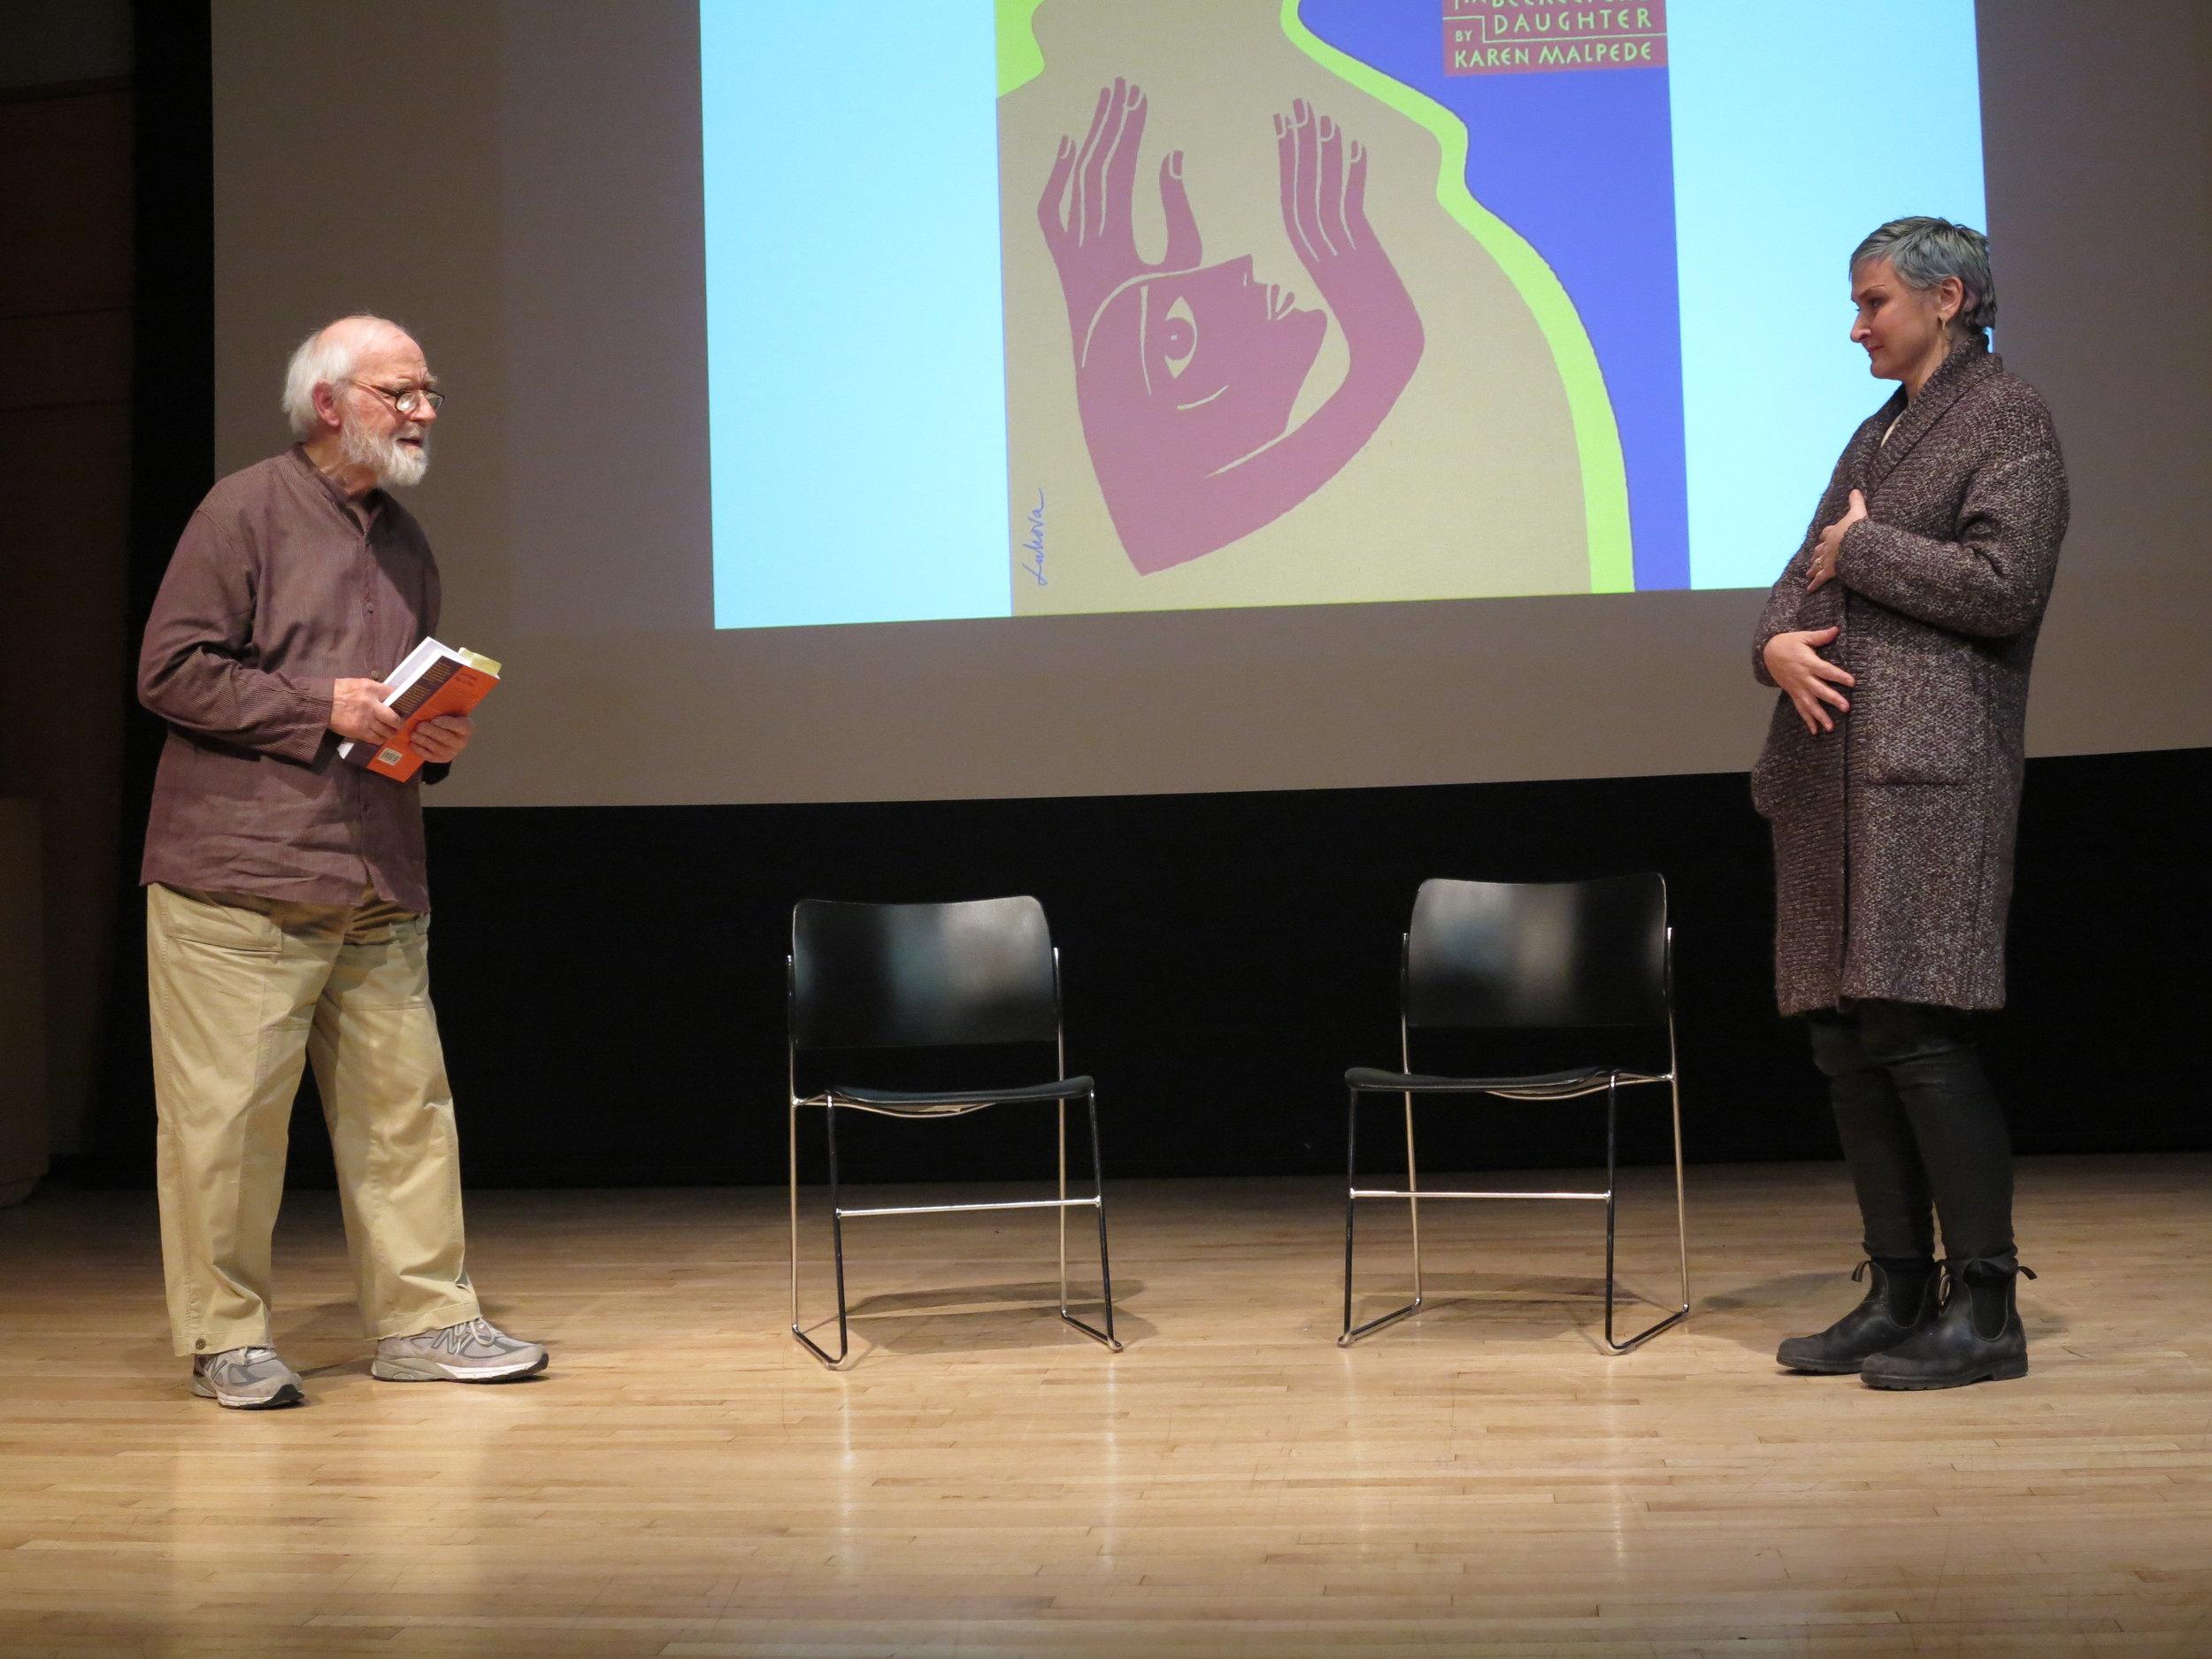 George Bartenieff and Christen Clifford